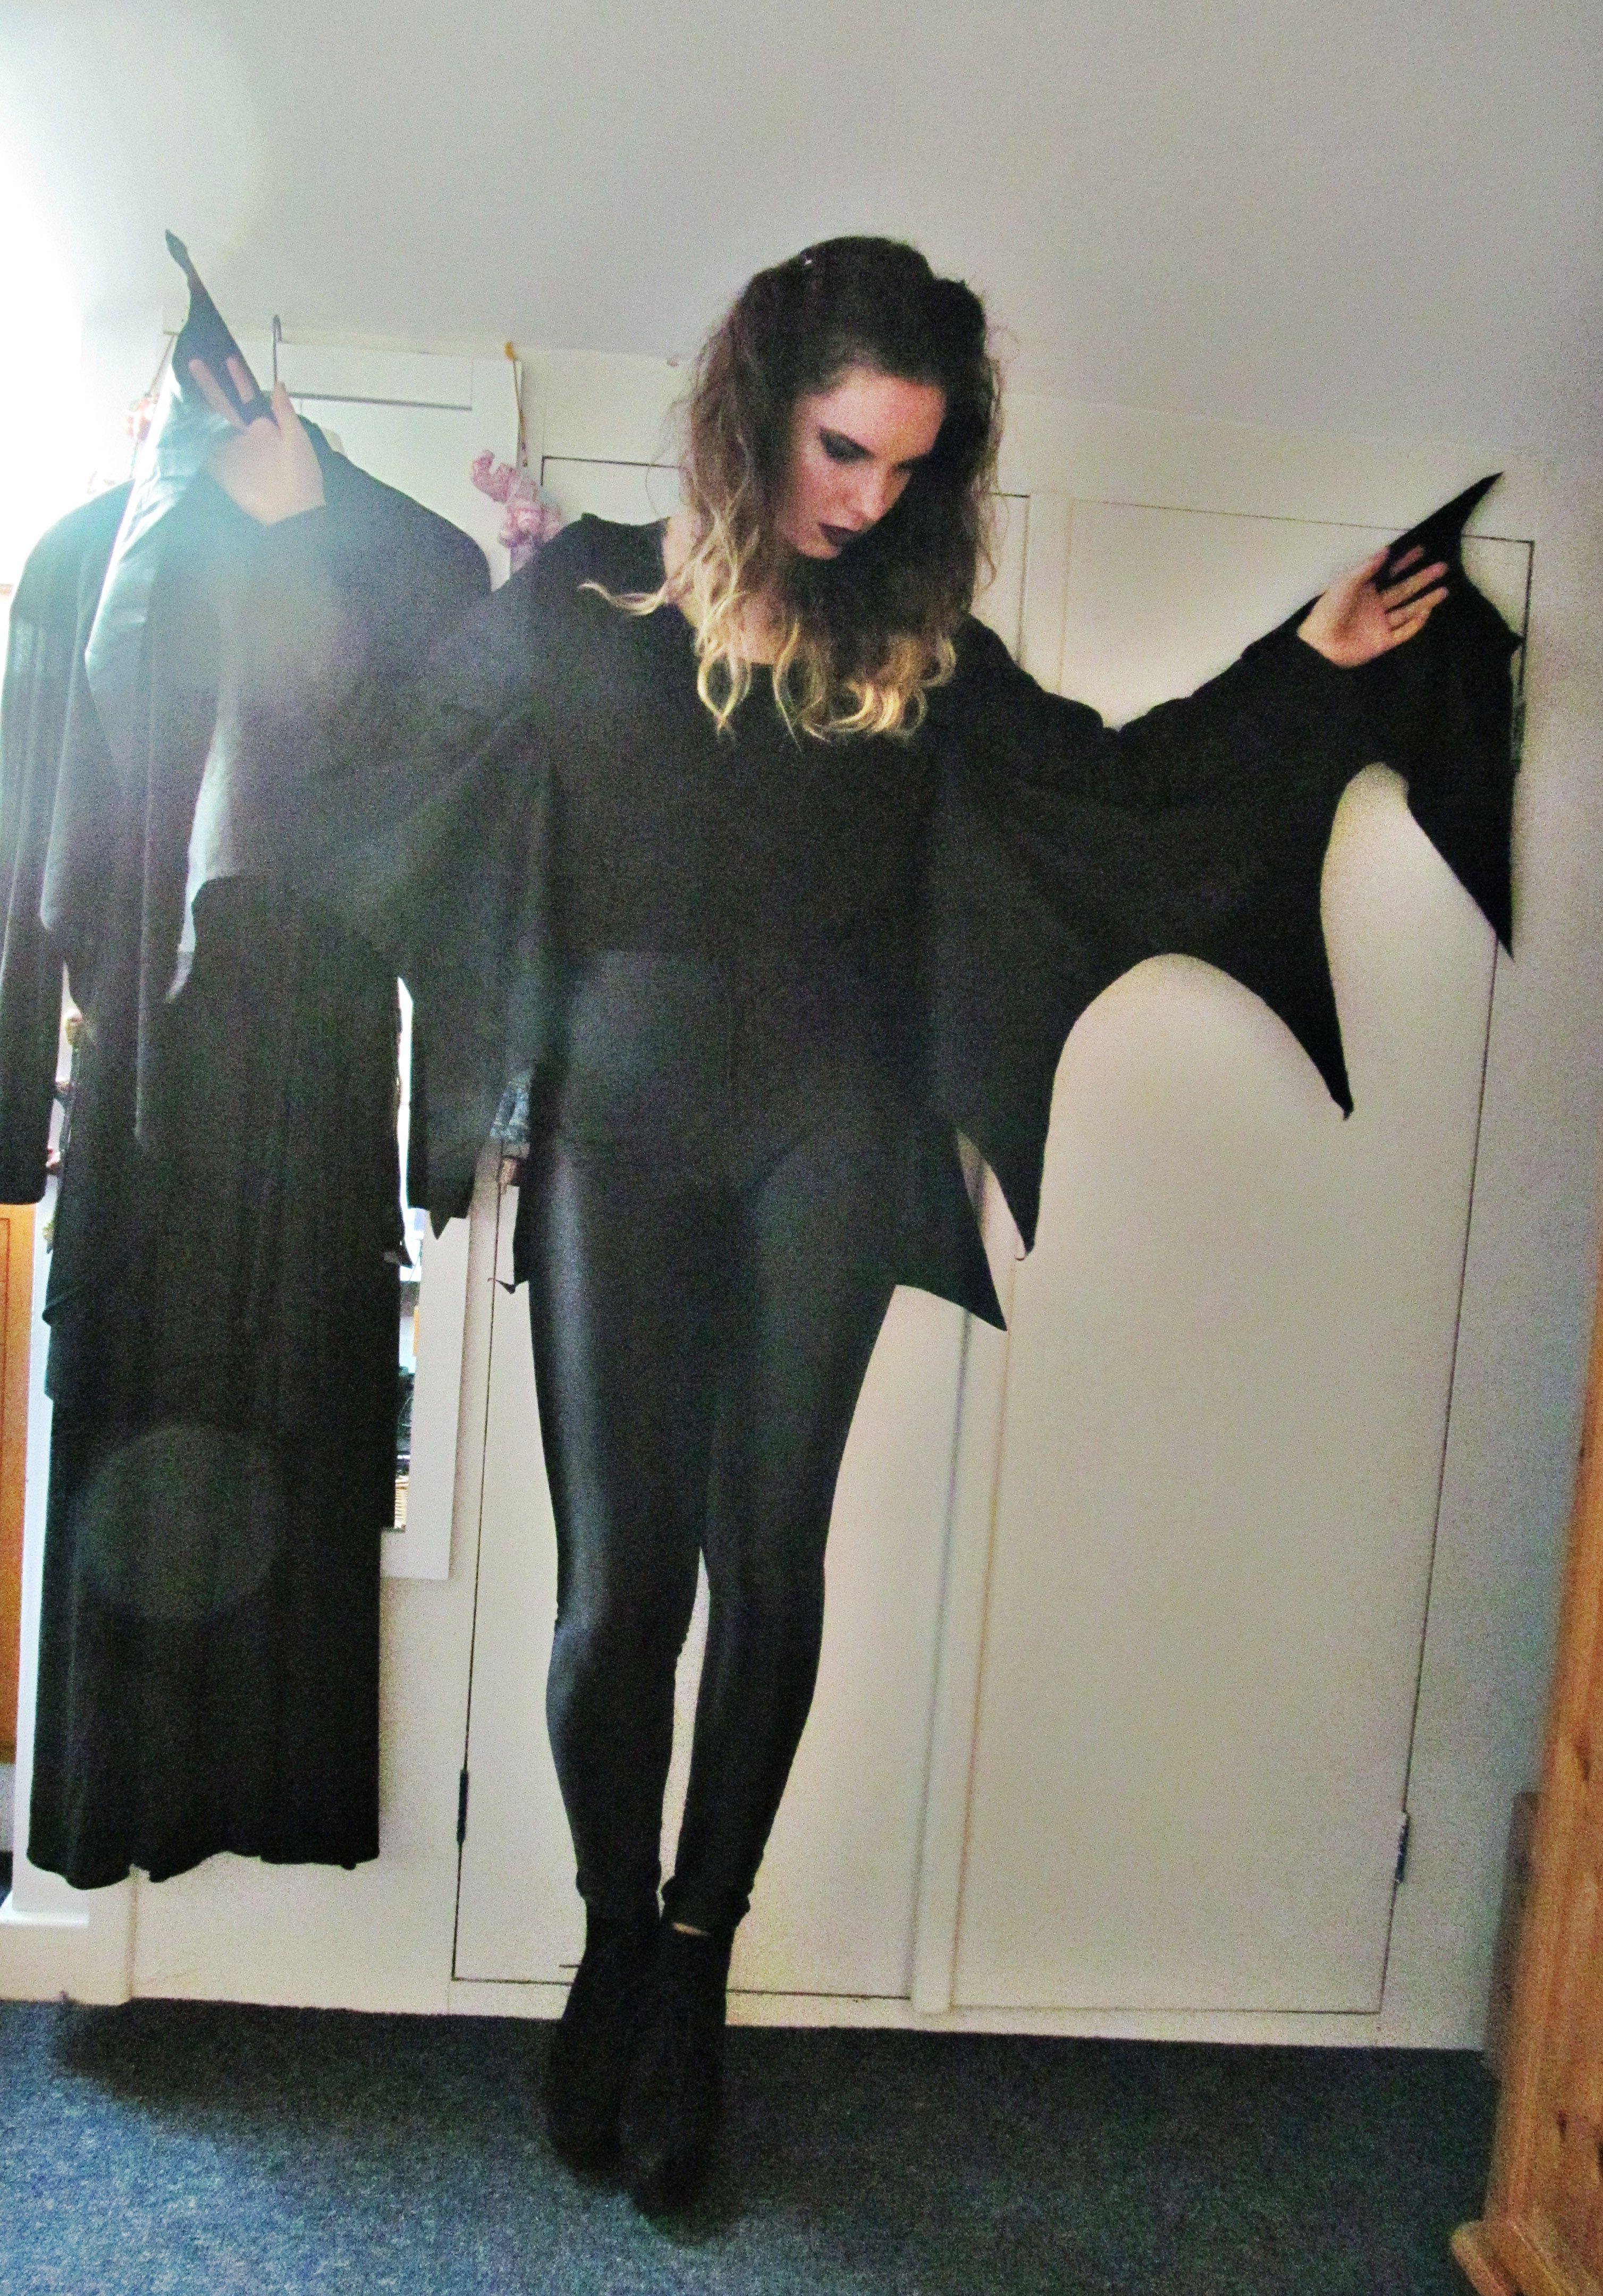 bat costume 12 | carnaval | Pinterest | Halloween ideas, Costumes ...